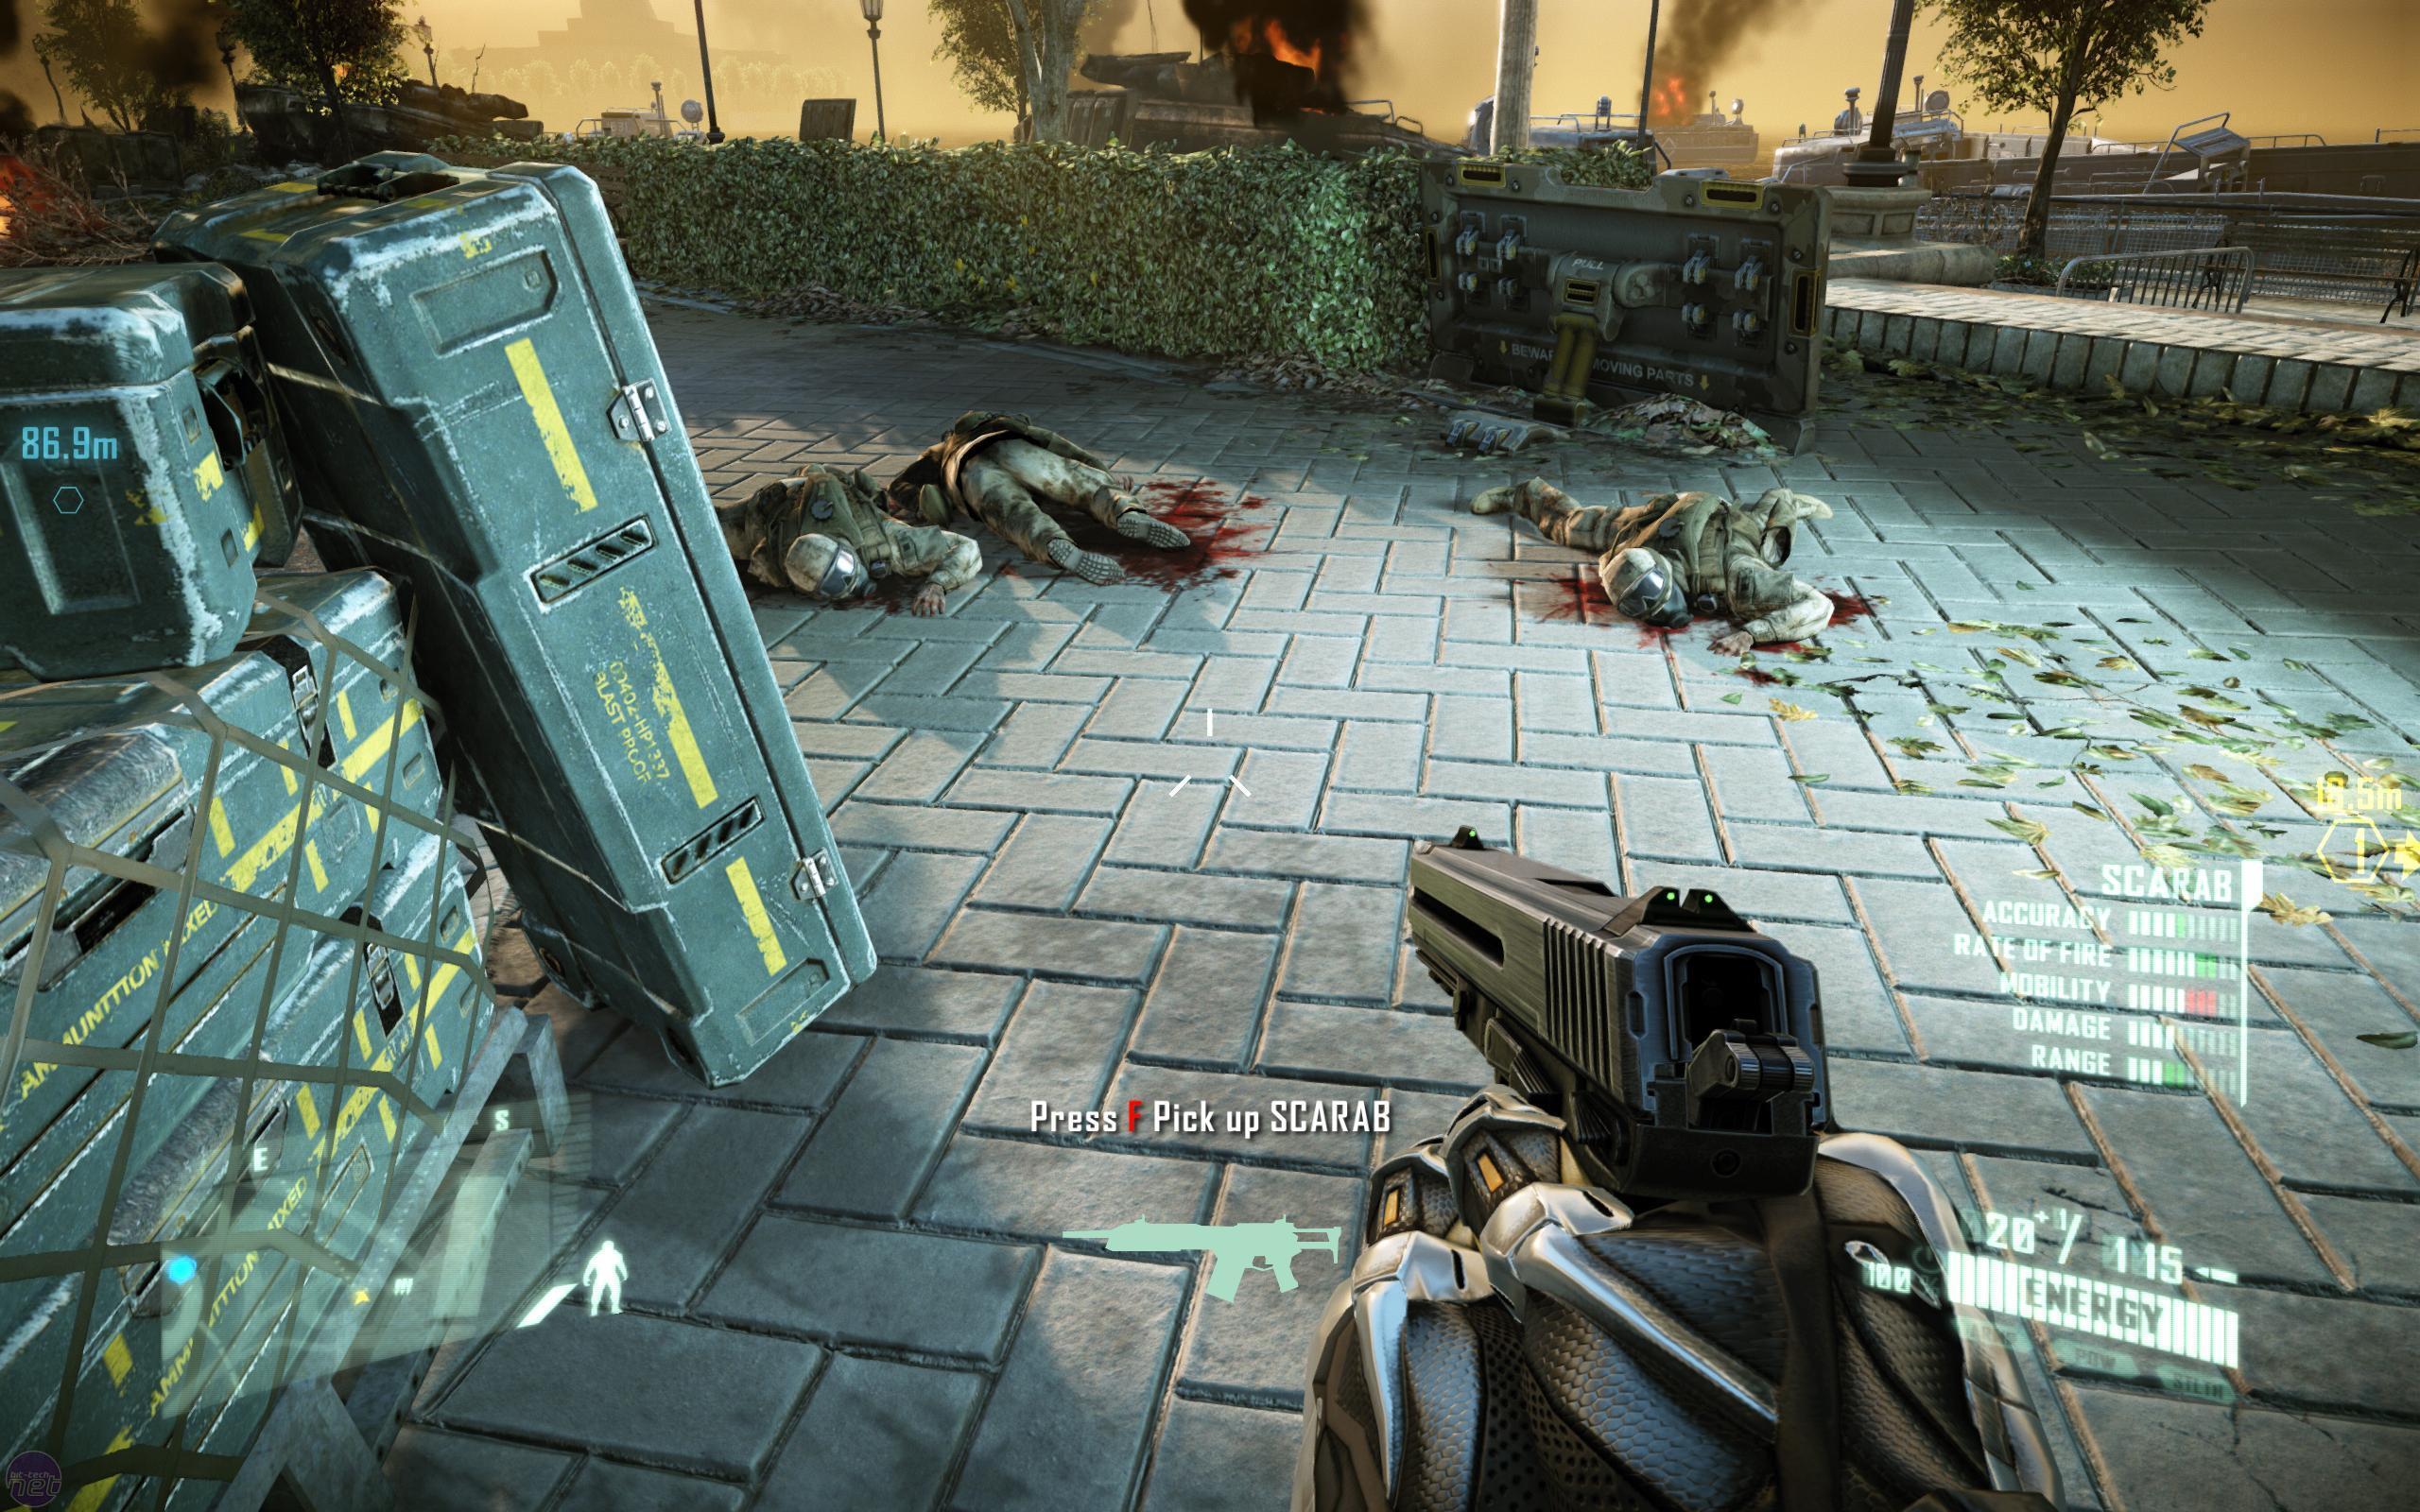 Call of Duty Black Ops 3 Torrent Download - CroTorrents